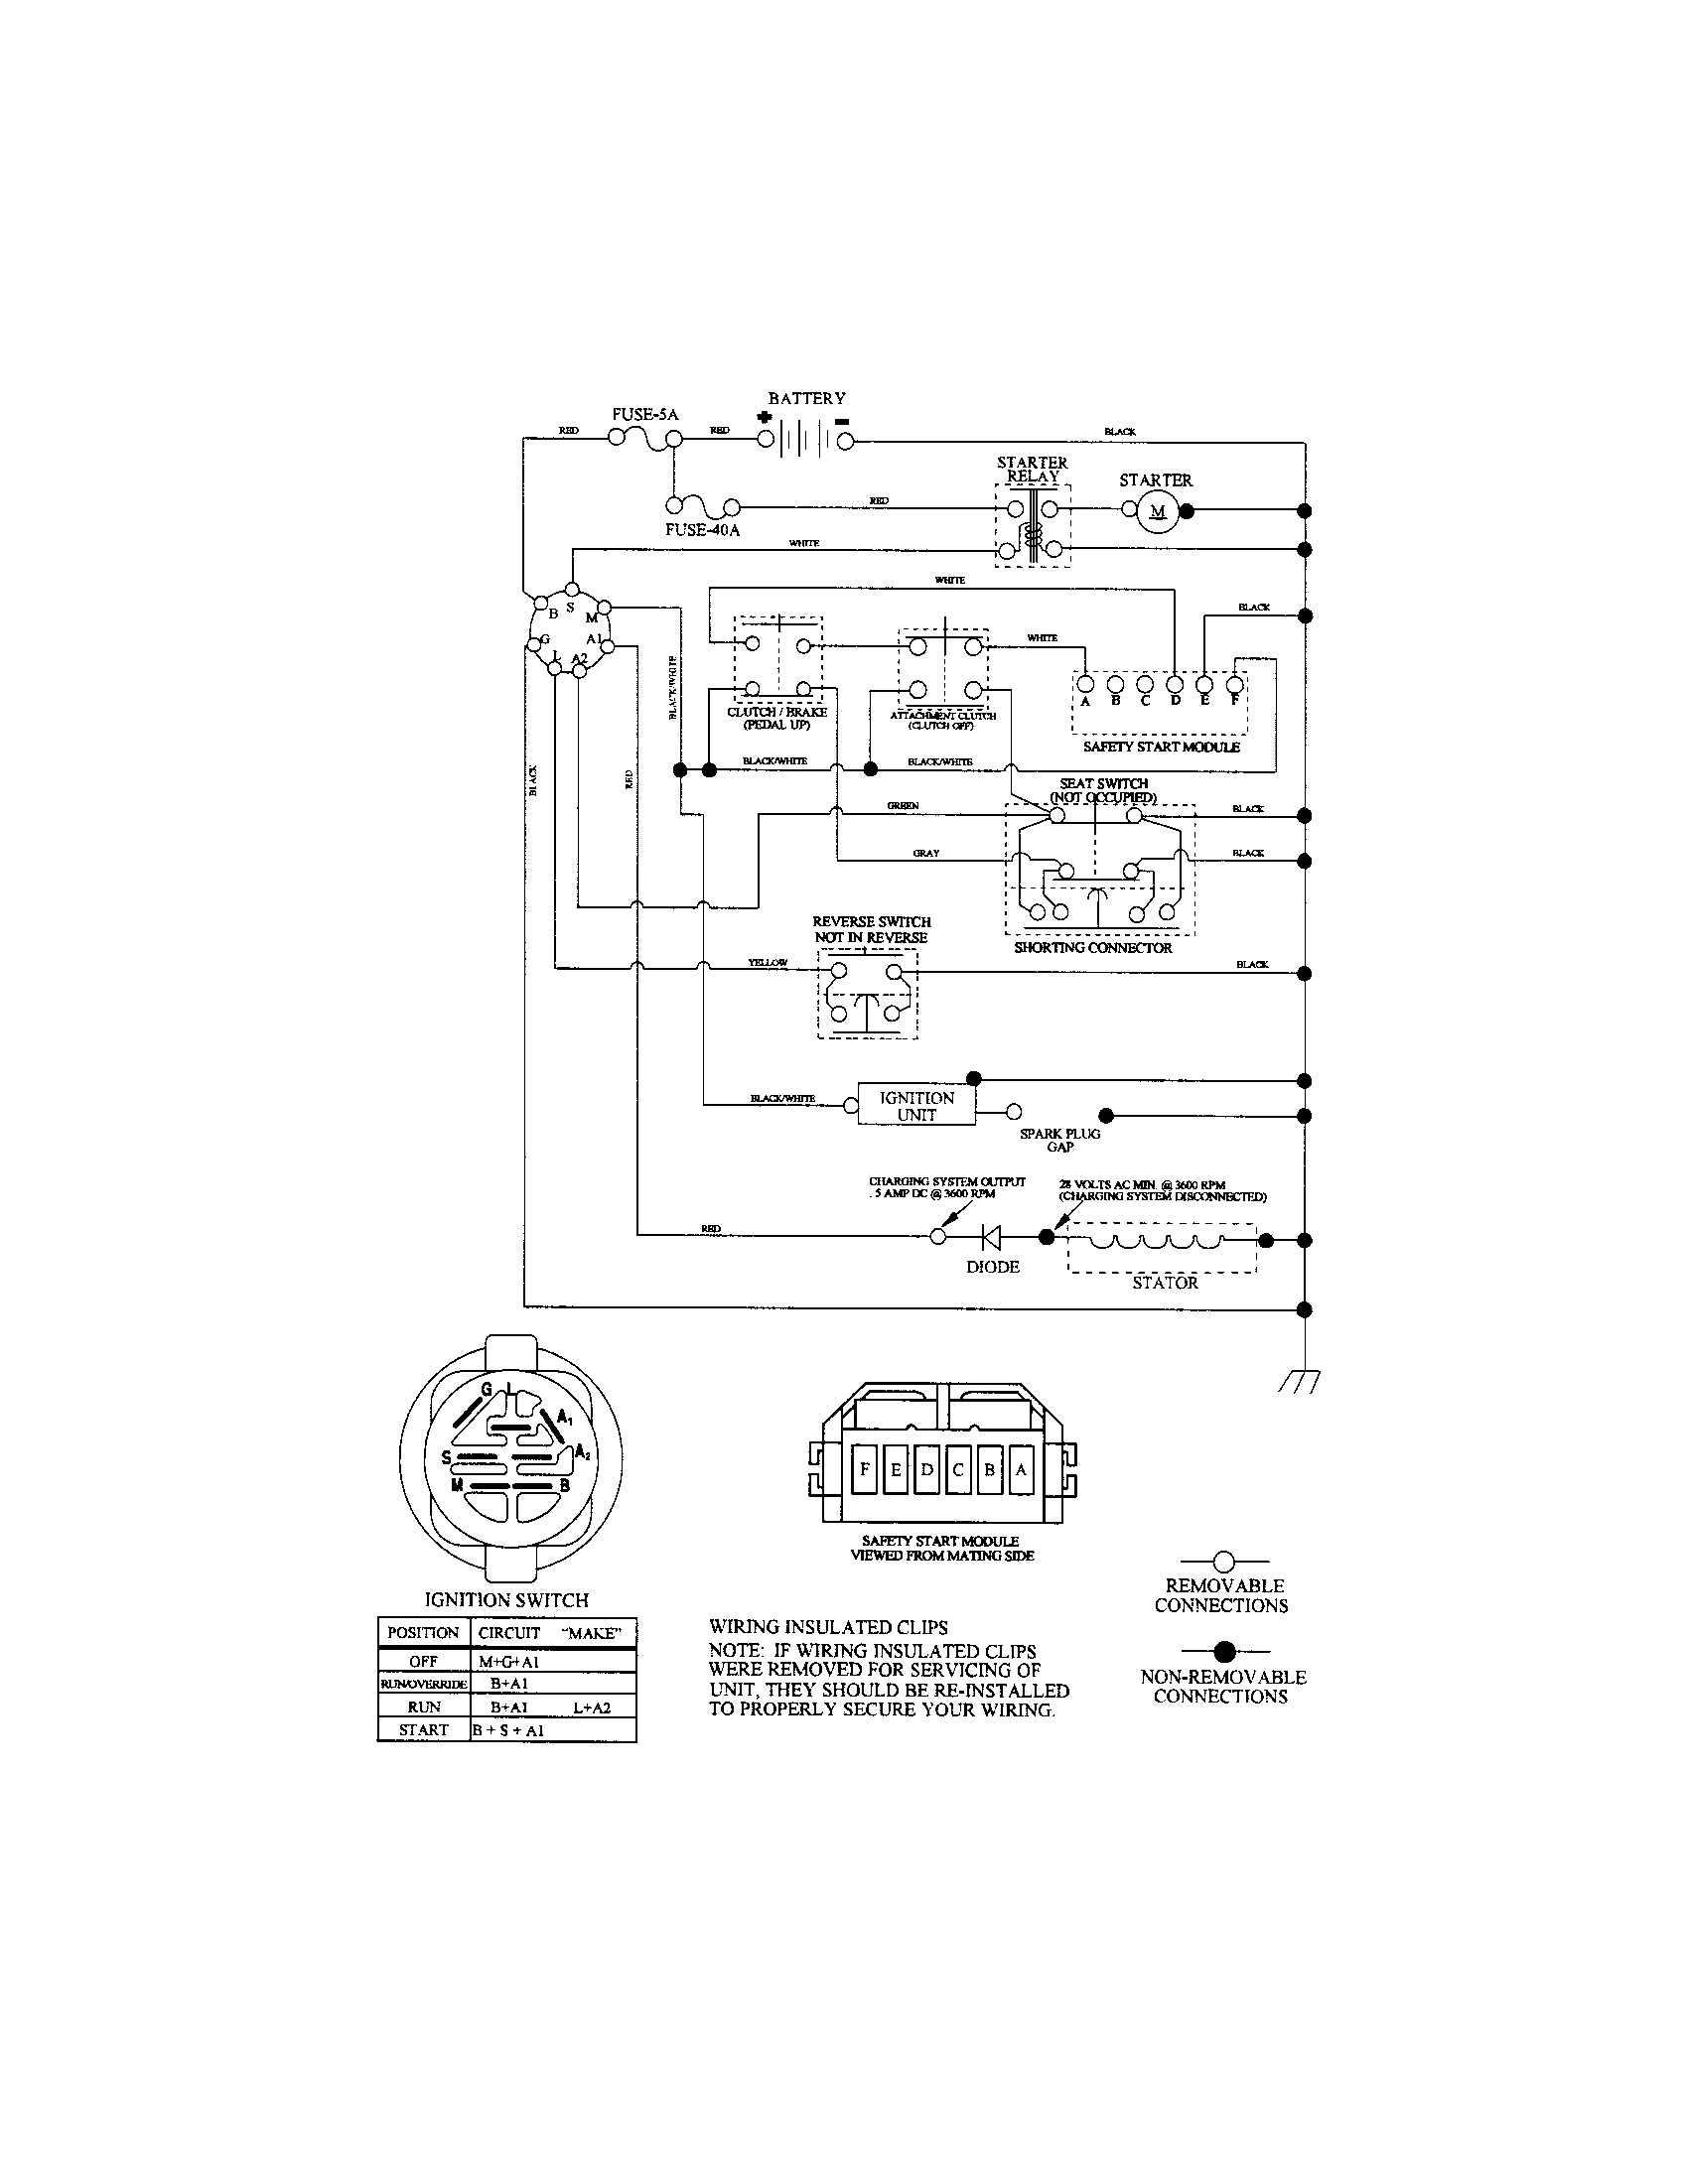 30 Craftsman Lawn Mower Model 917 Wiring Diagram